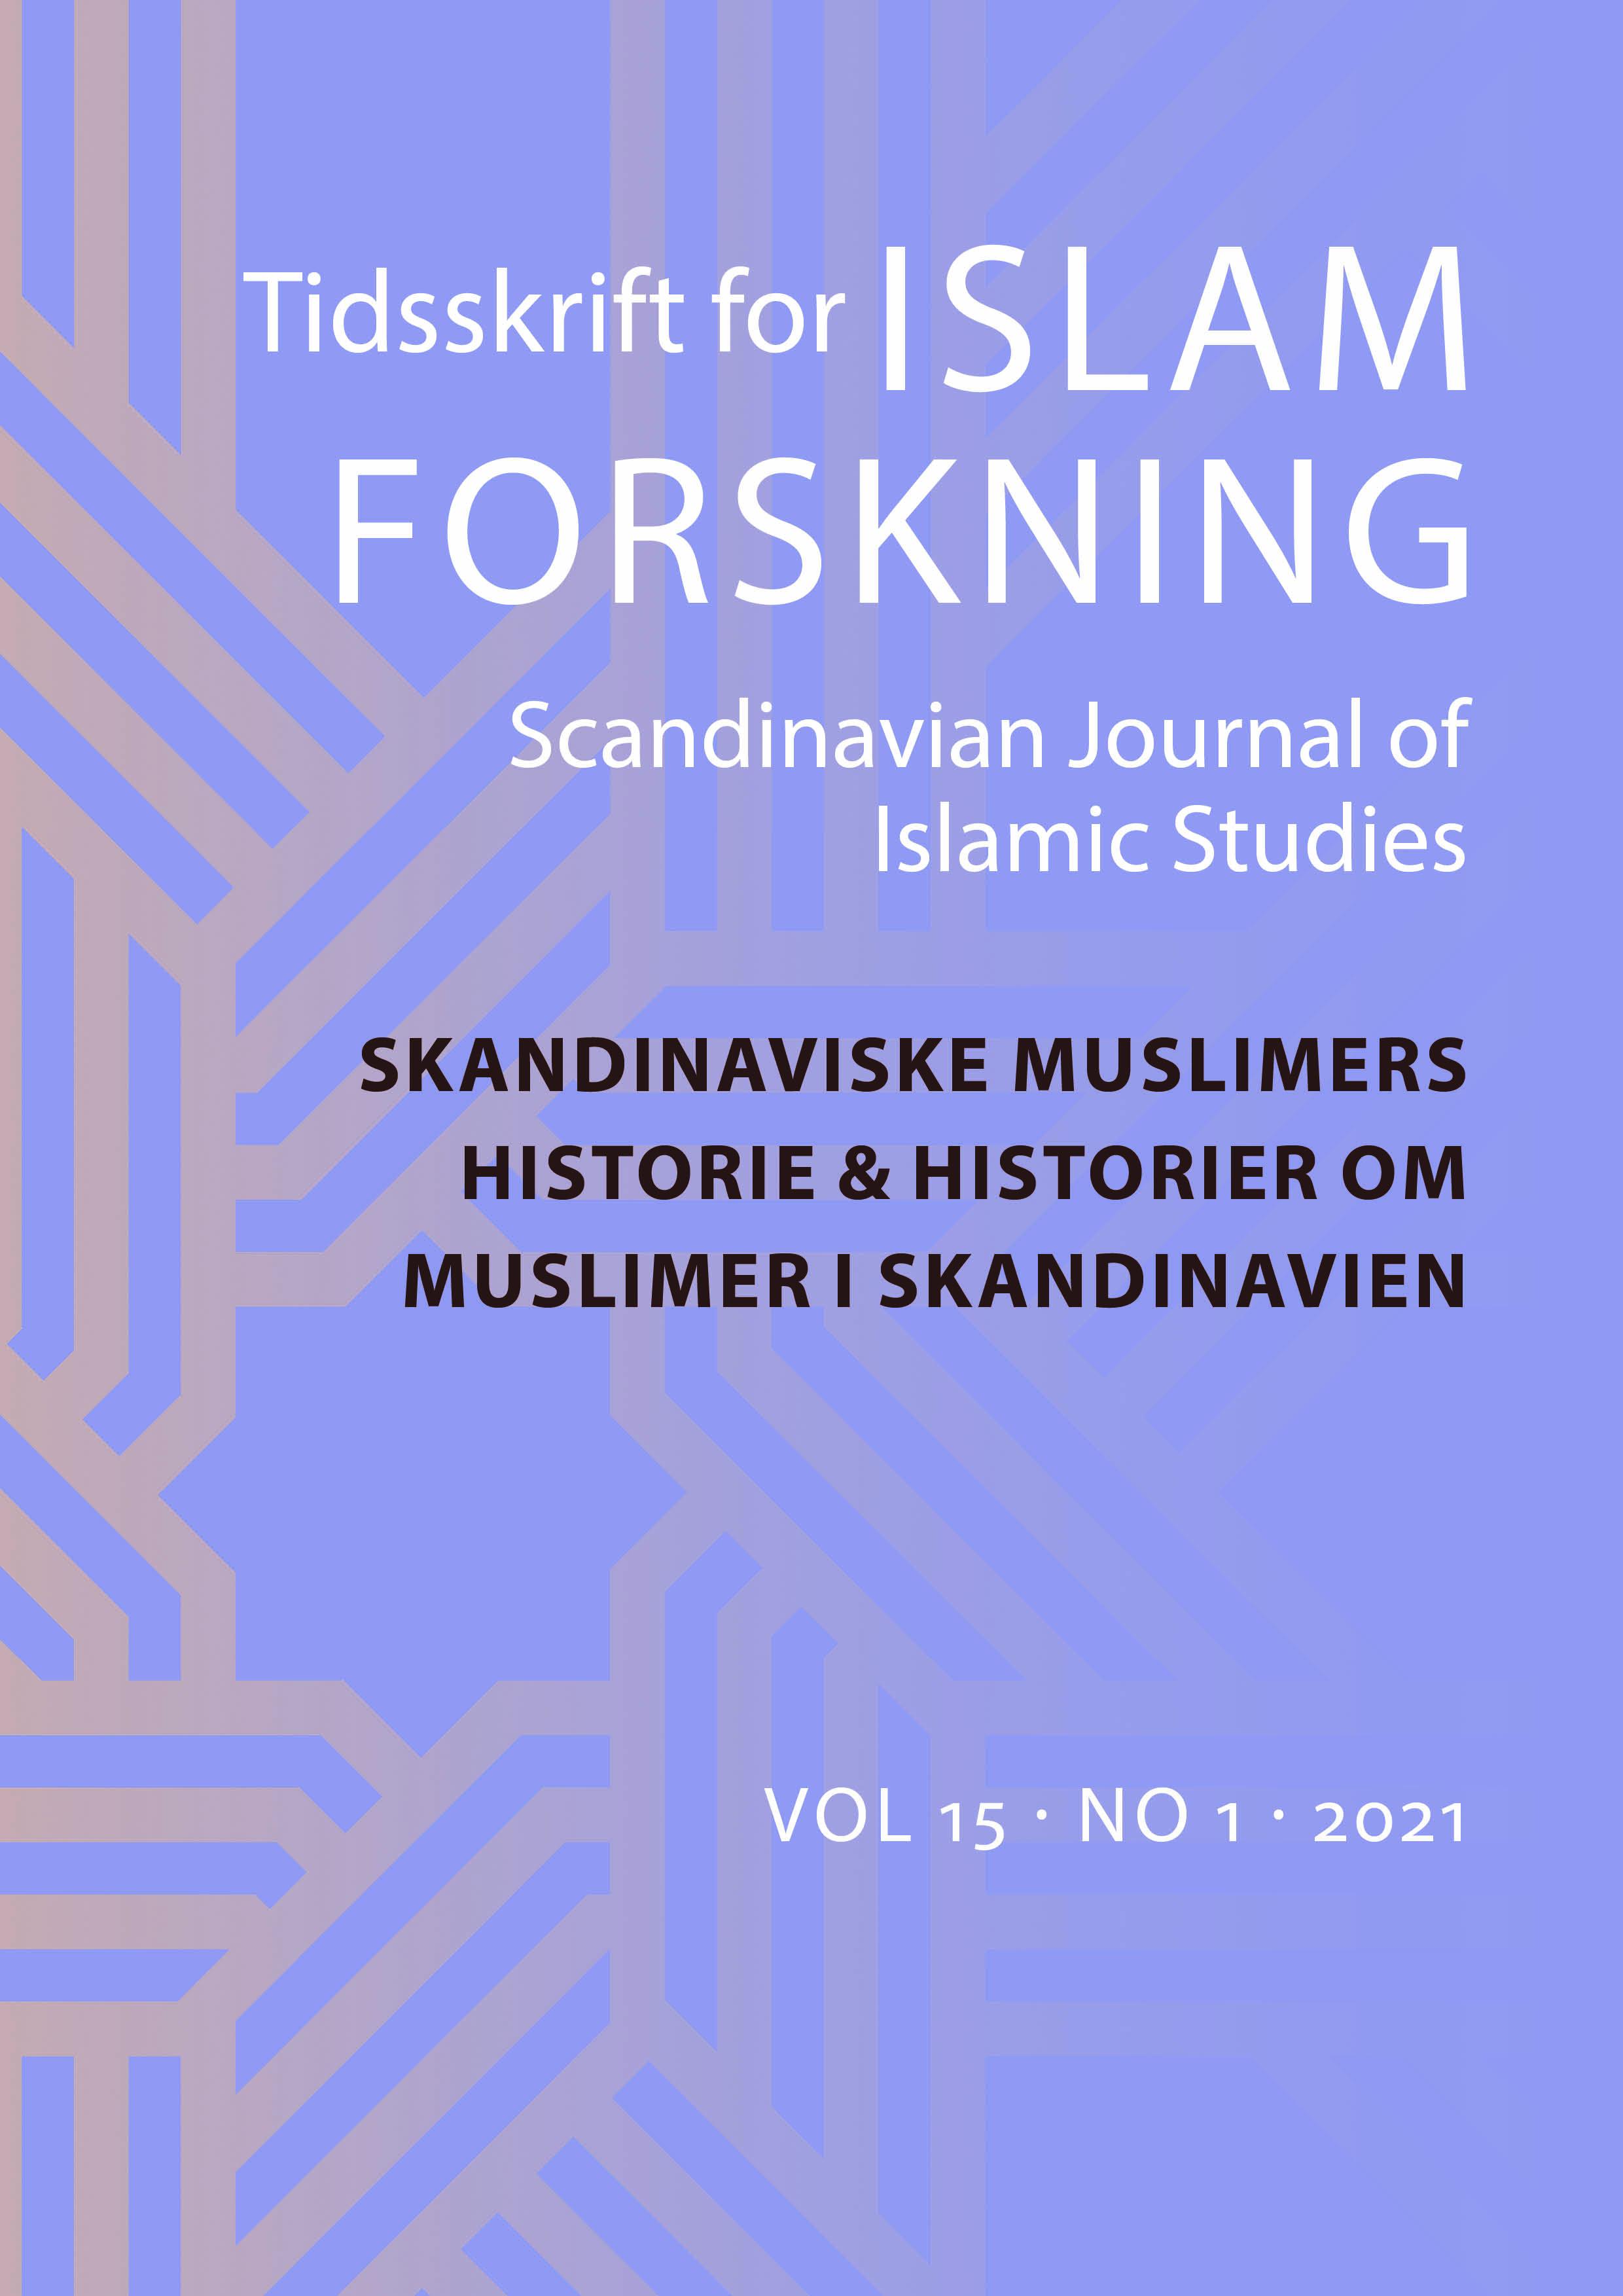 Se Årg. 15 Nr. 1 (2021): Skandinaviske muslimers historie & historier om muslimer i Skandinavien